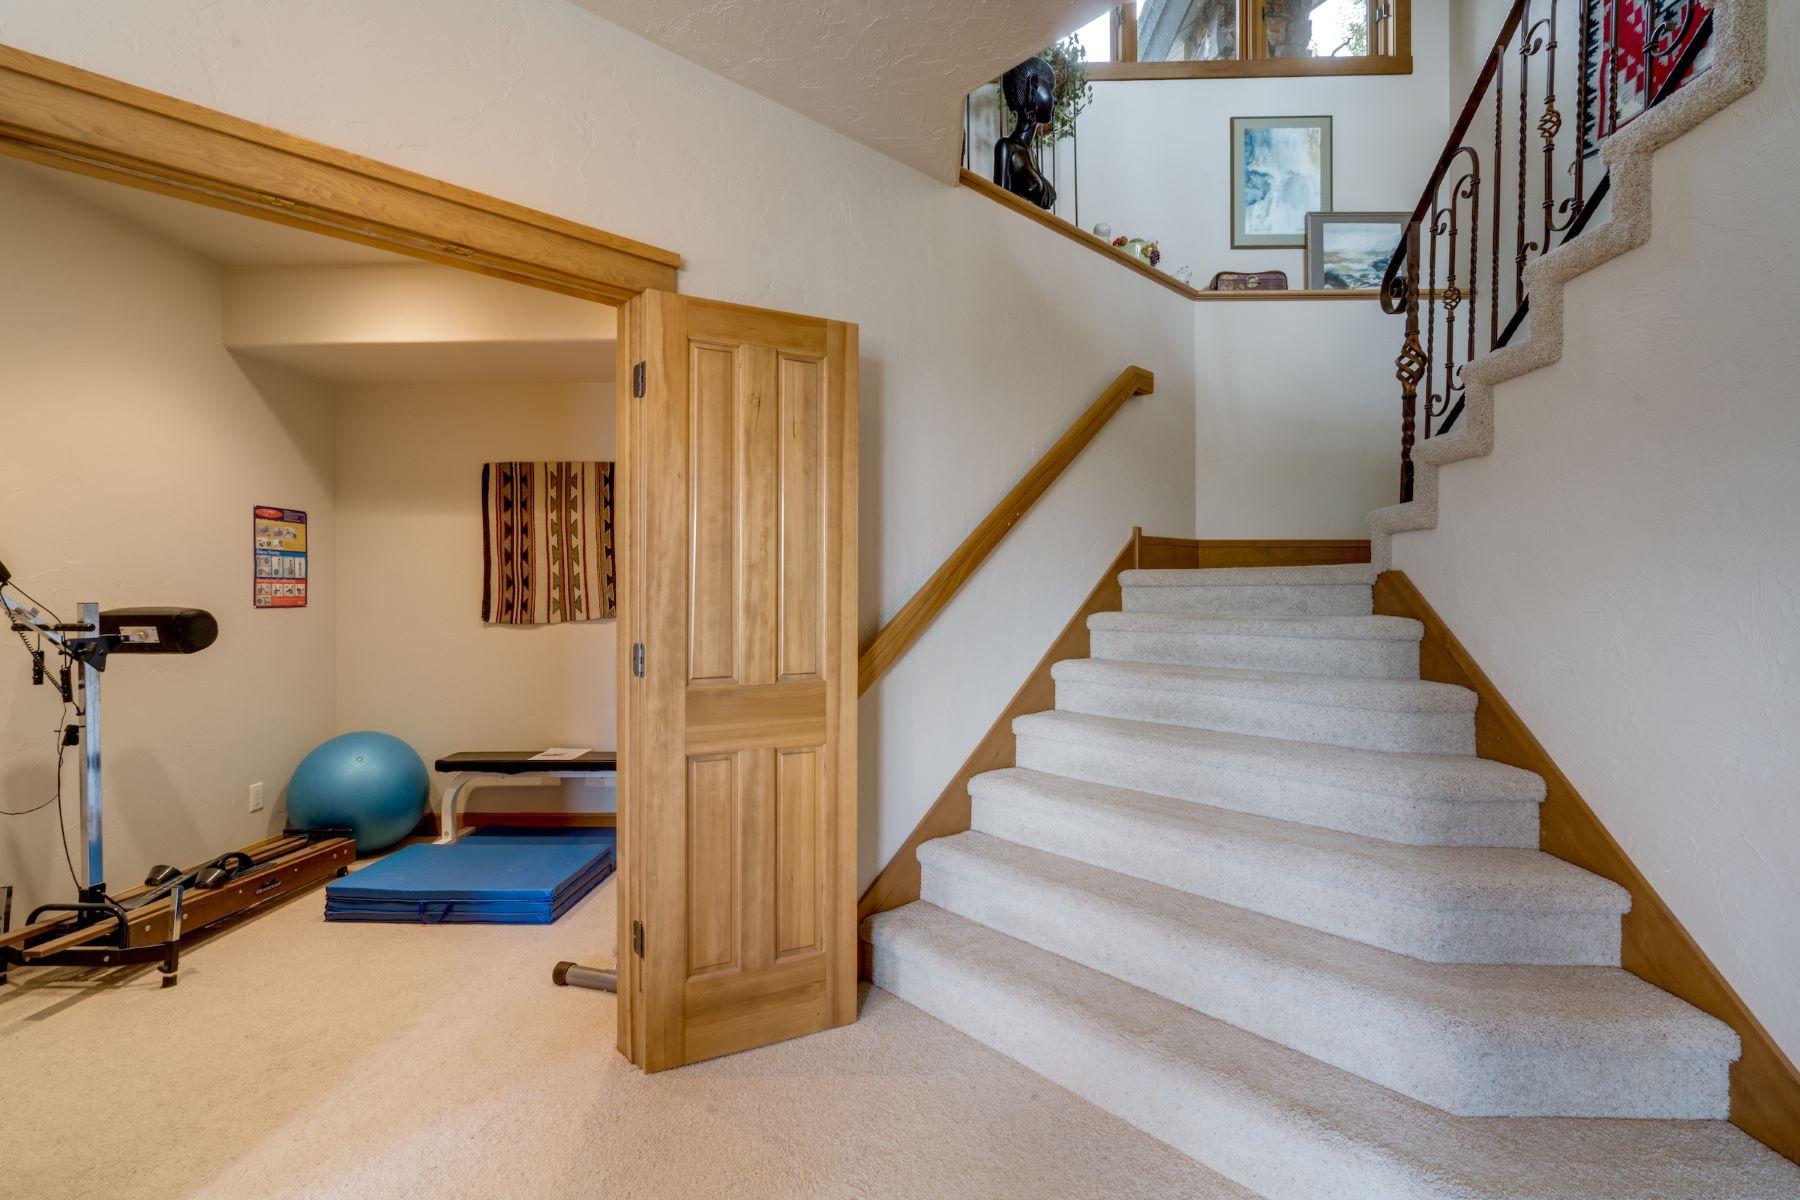 Additional photo for property listing at Diamondback 35 Acre Estate 44300 Diamondback Way Steamboat Springs, Colorado 80487 United States